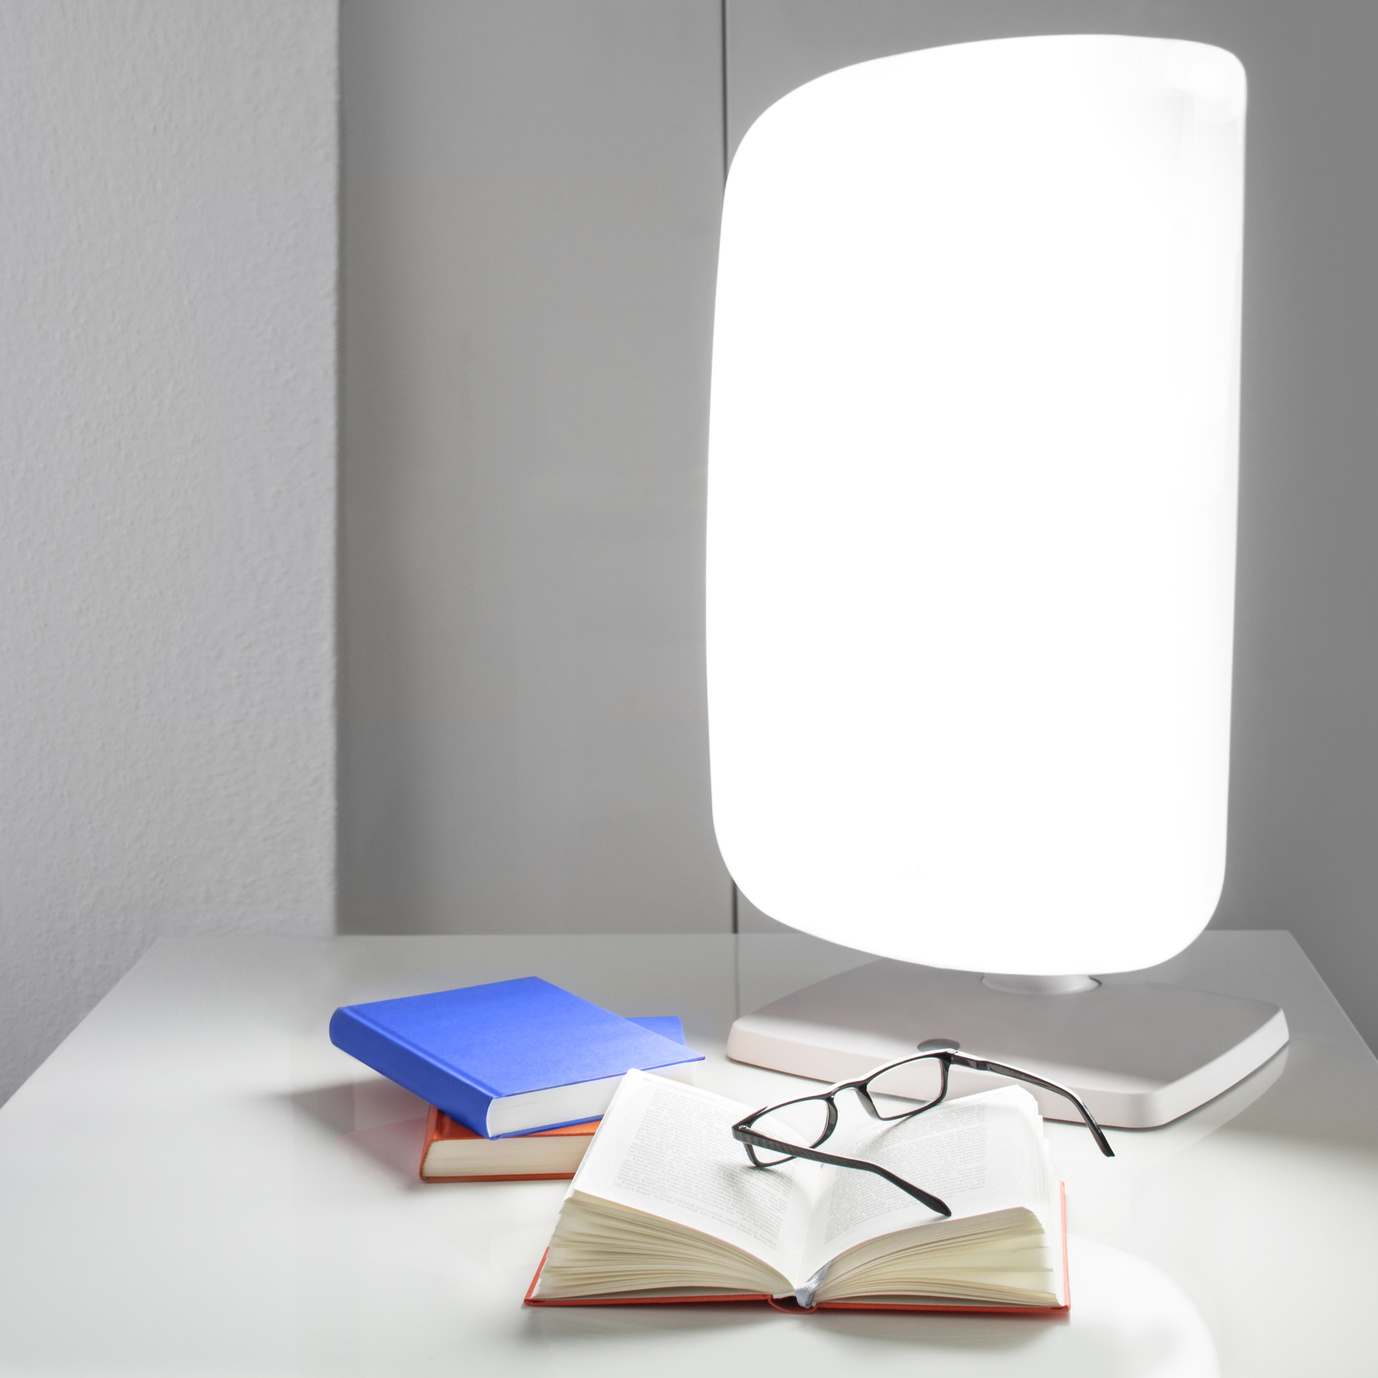 choisir lame luminotherapie